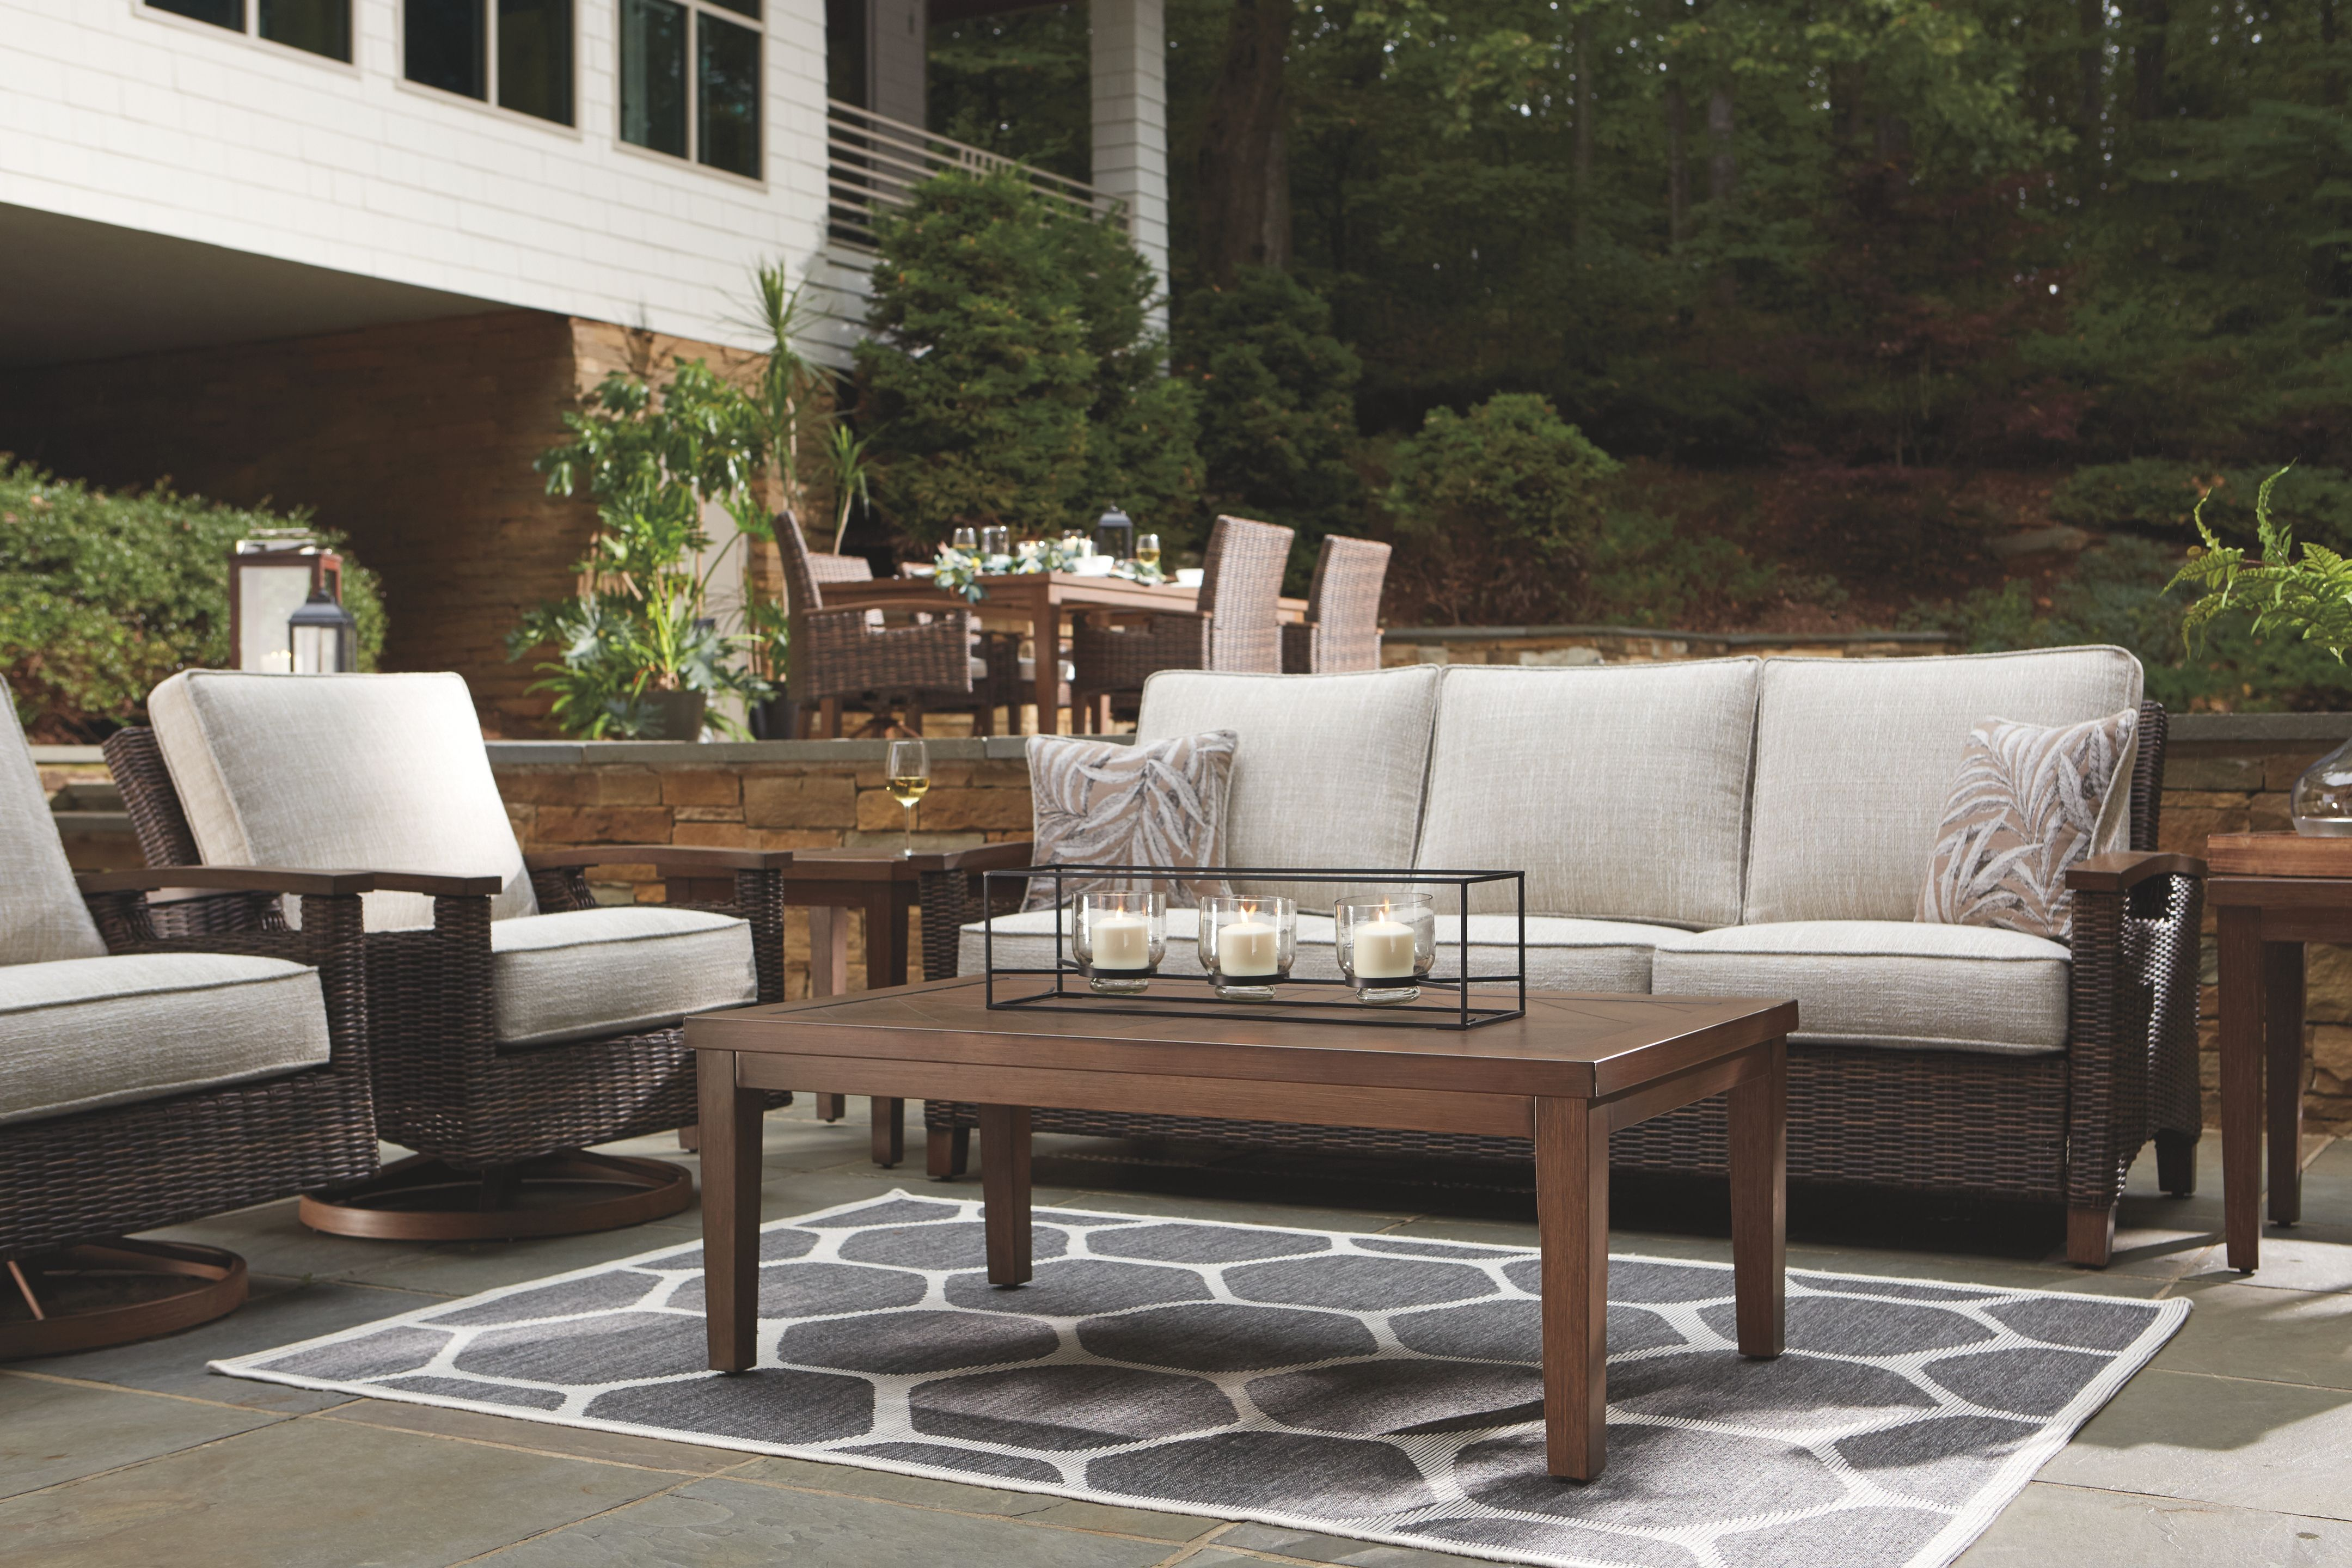 Paradise Trail Sofa With Cushion Ashley Furniture Homestore Outdoor Sofa Sets Outdoor Sofa Patio Furniture Conversation Sets